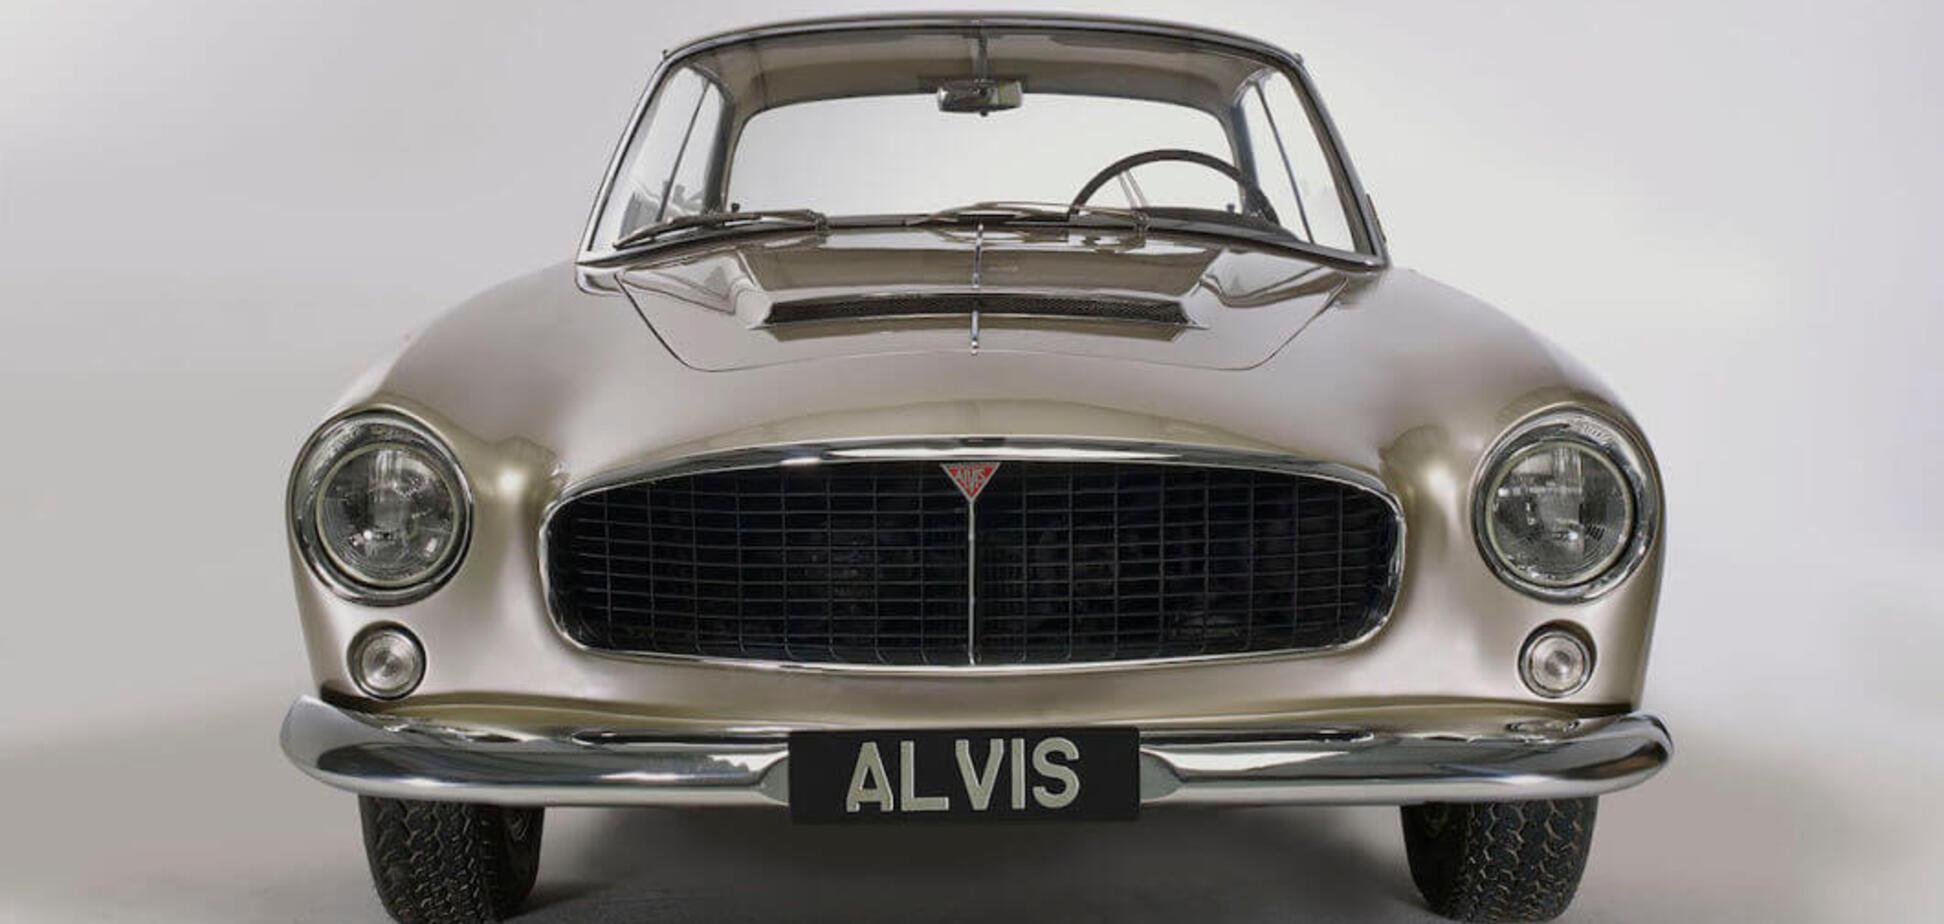 Британский Alvis возобновил производство модели 1967 года